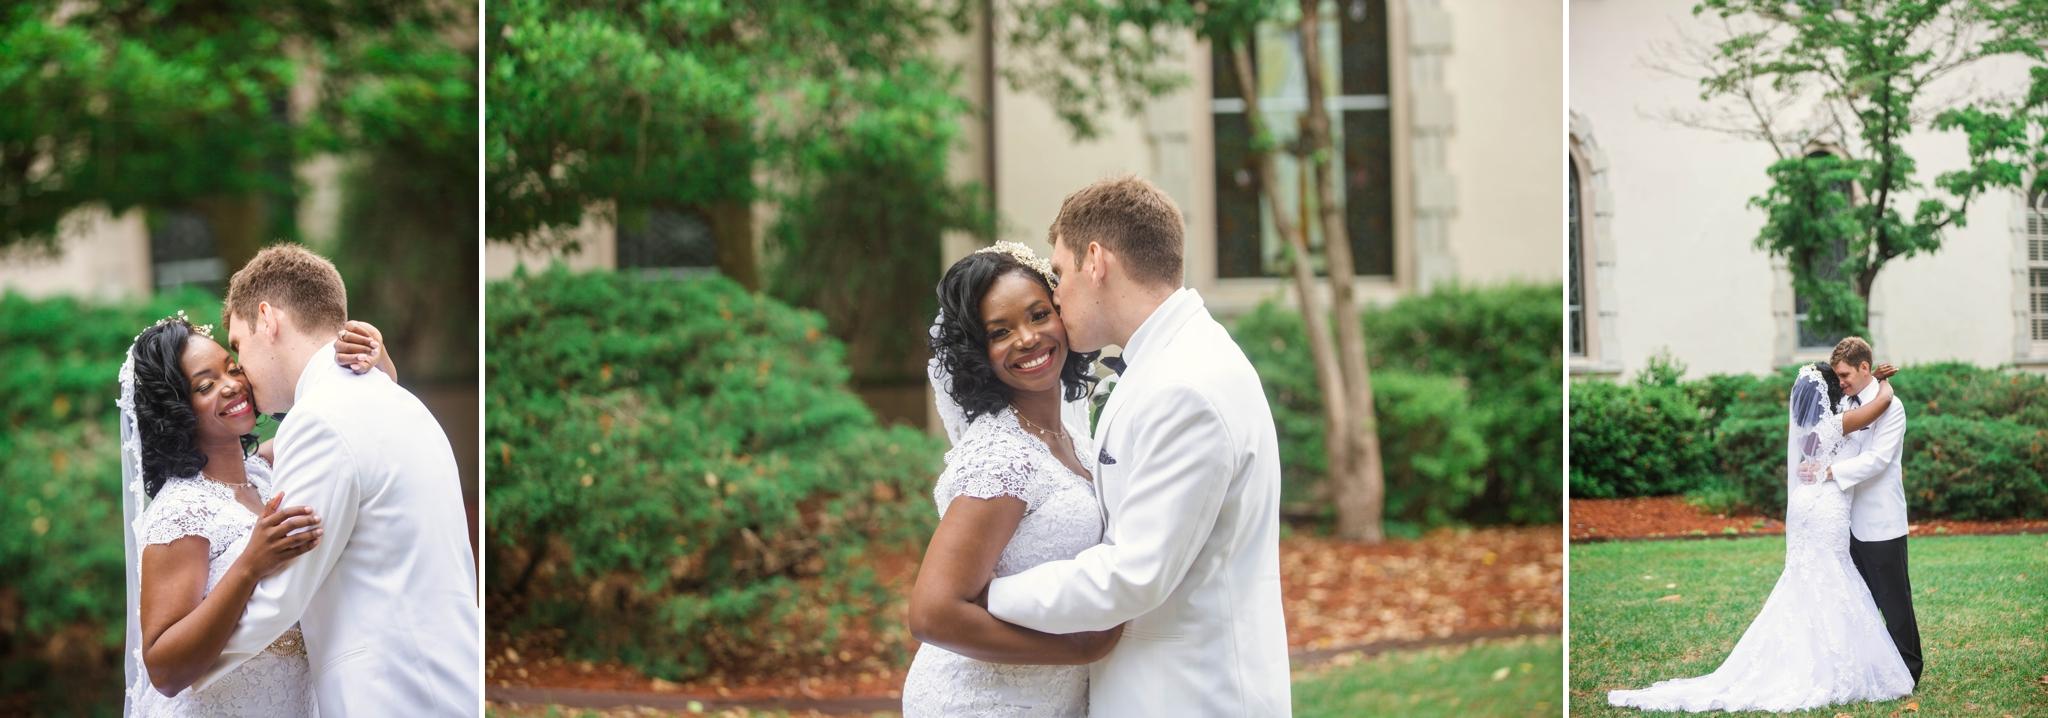 Adrianne + Adam - Wedding at Main Post Chapel in Fort Bragg, NC - Fayetteville North Carolina Photographer